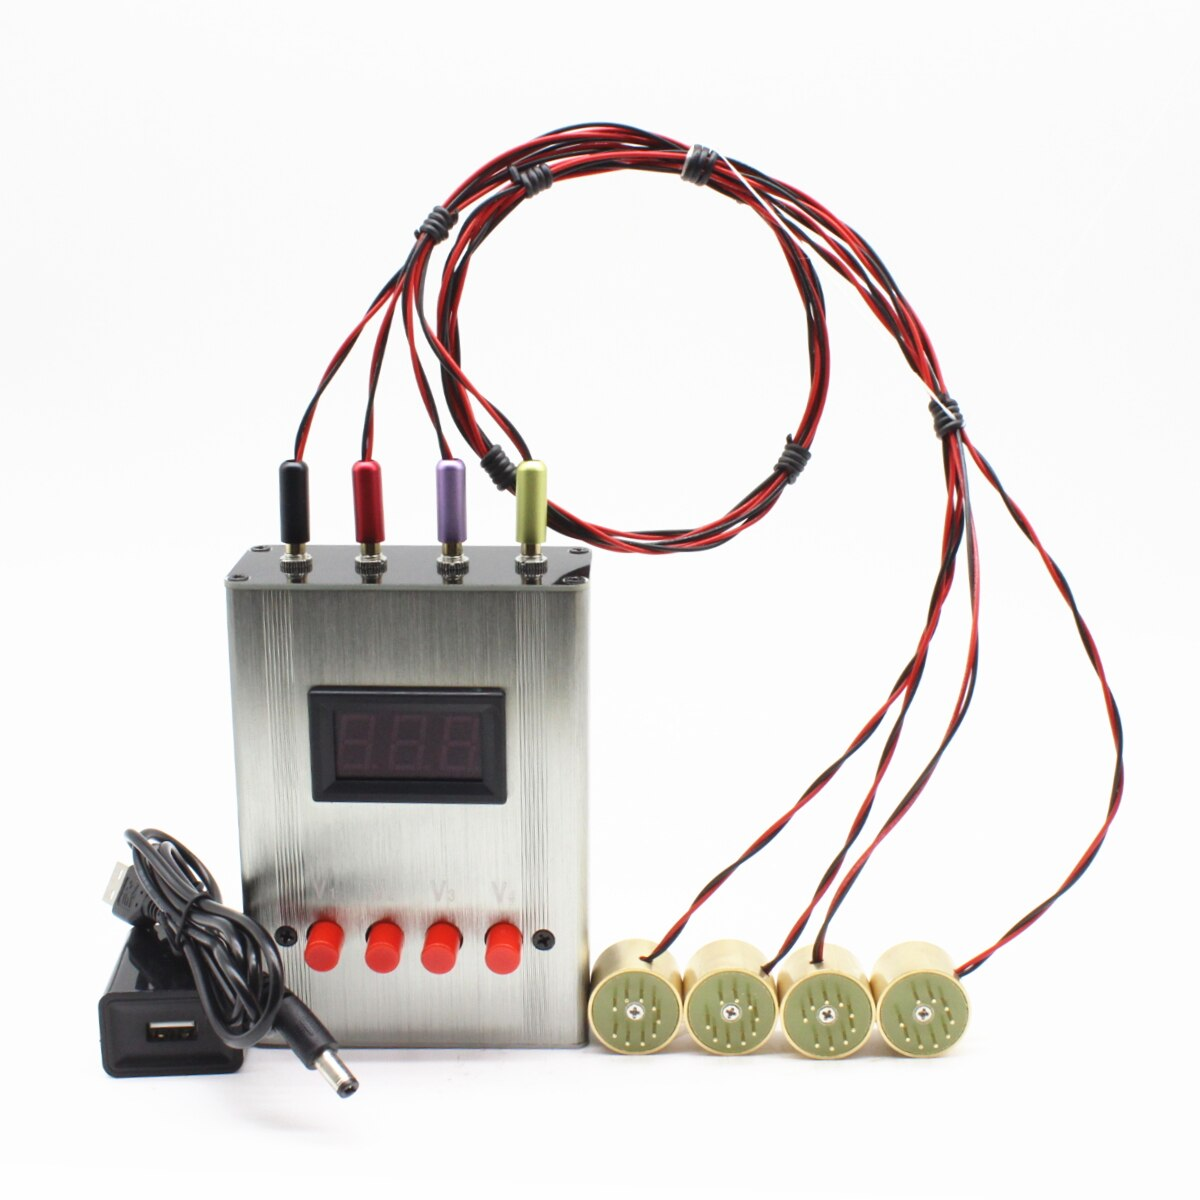 V8 Checker EL84 6BQ5 EL34 KT88 75917591A 6L6 6CA7 6V6 5881 6550 KT66 KT100 KT120 Vacuum Tube Tester Amplifier Bias mA Version enlarge